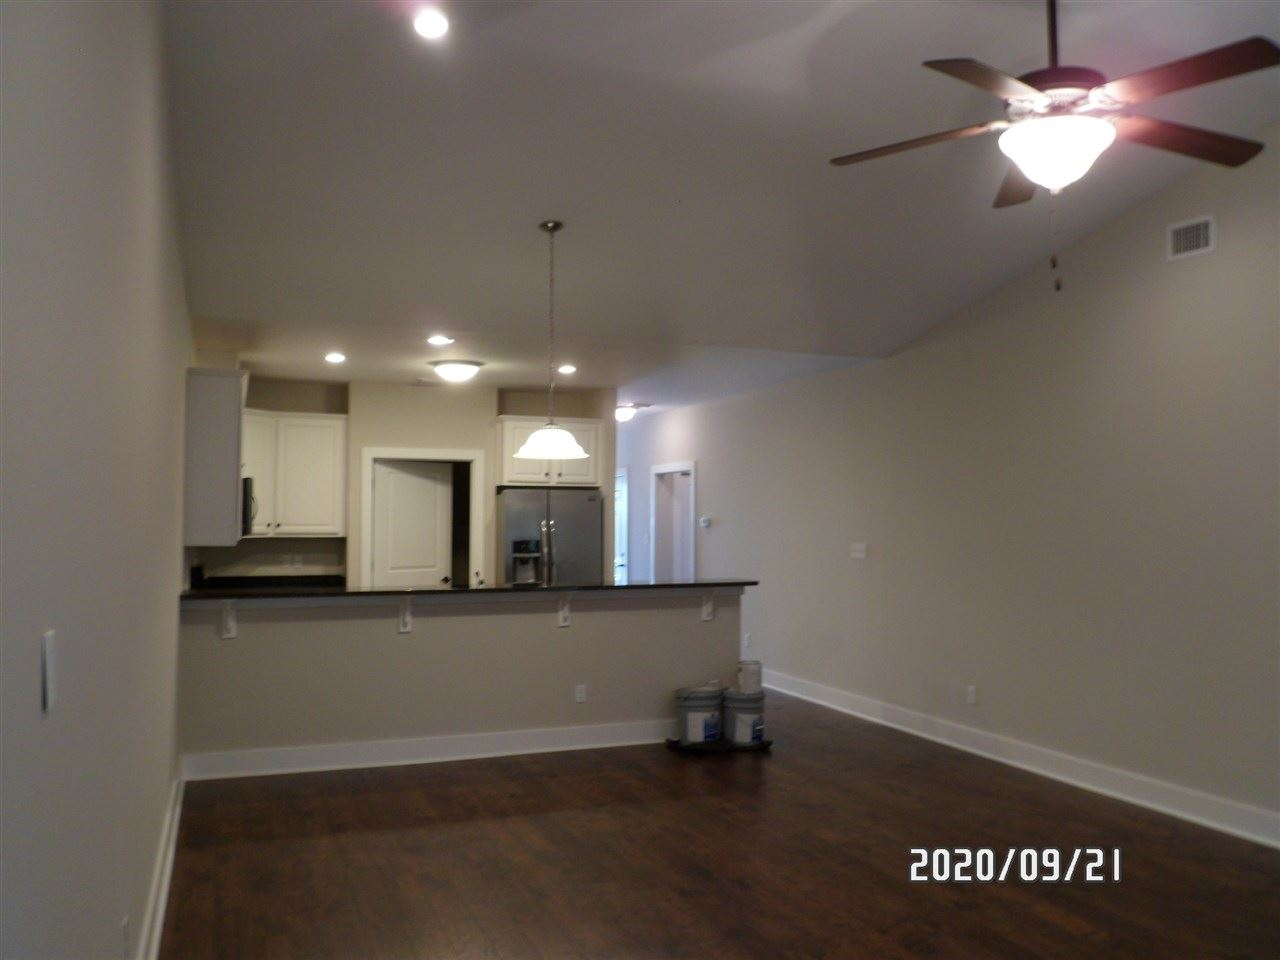 Photo of 1593 Miccosukee Loop, TALLAHASSEE, FL 32308 (MLS # 323586)